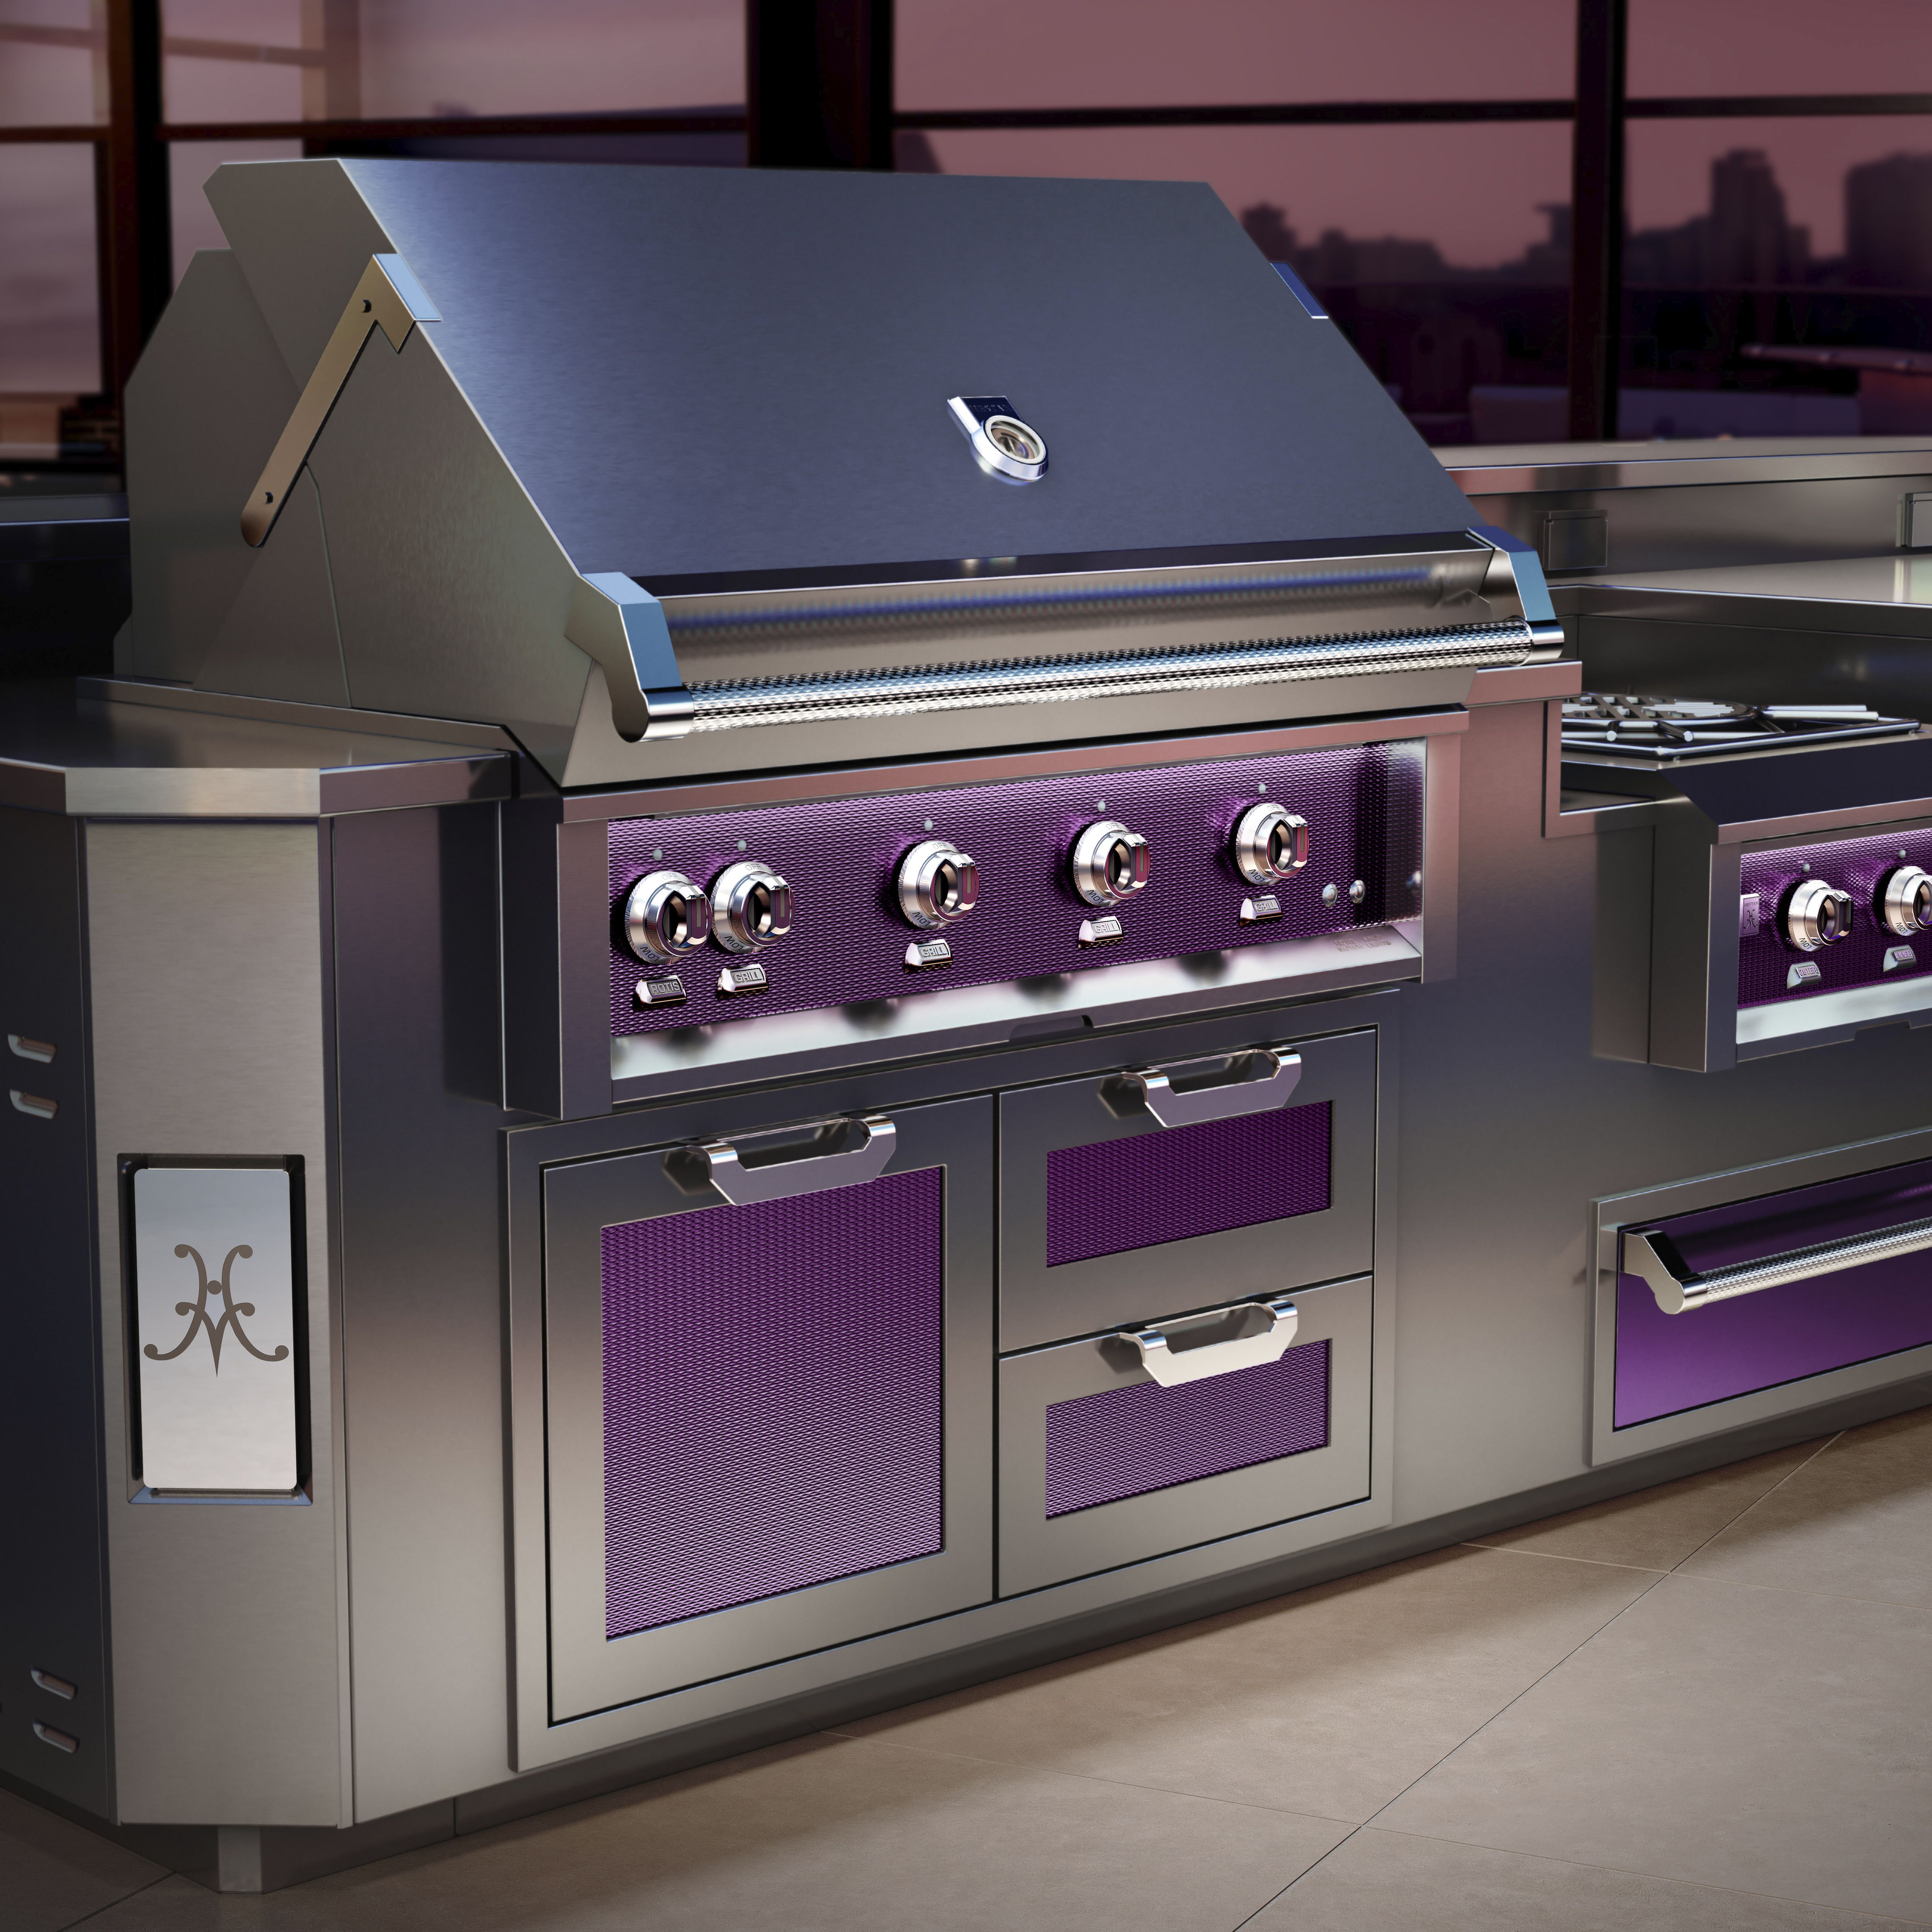 Full Outdoor Kitchen Natural Gas Outdoor Kitchen Hestan Outdoor Kitchen Stainless Steel Doors Built In Grill